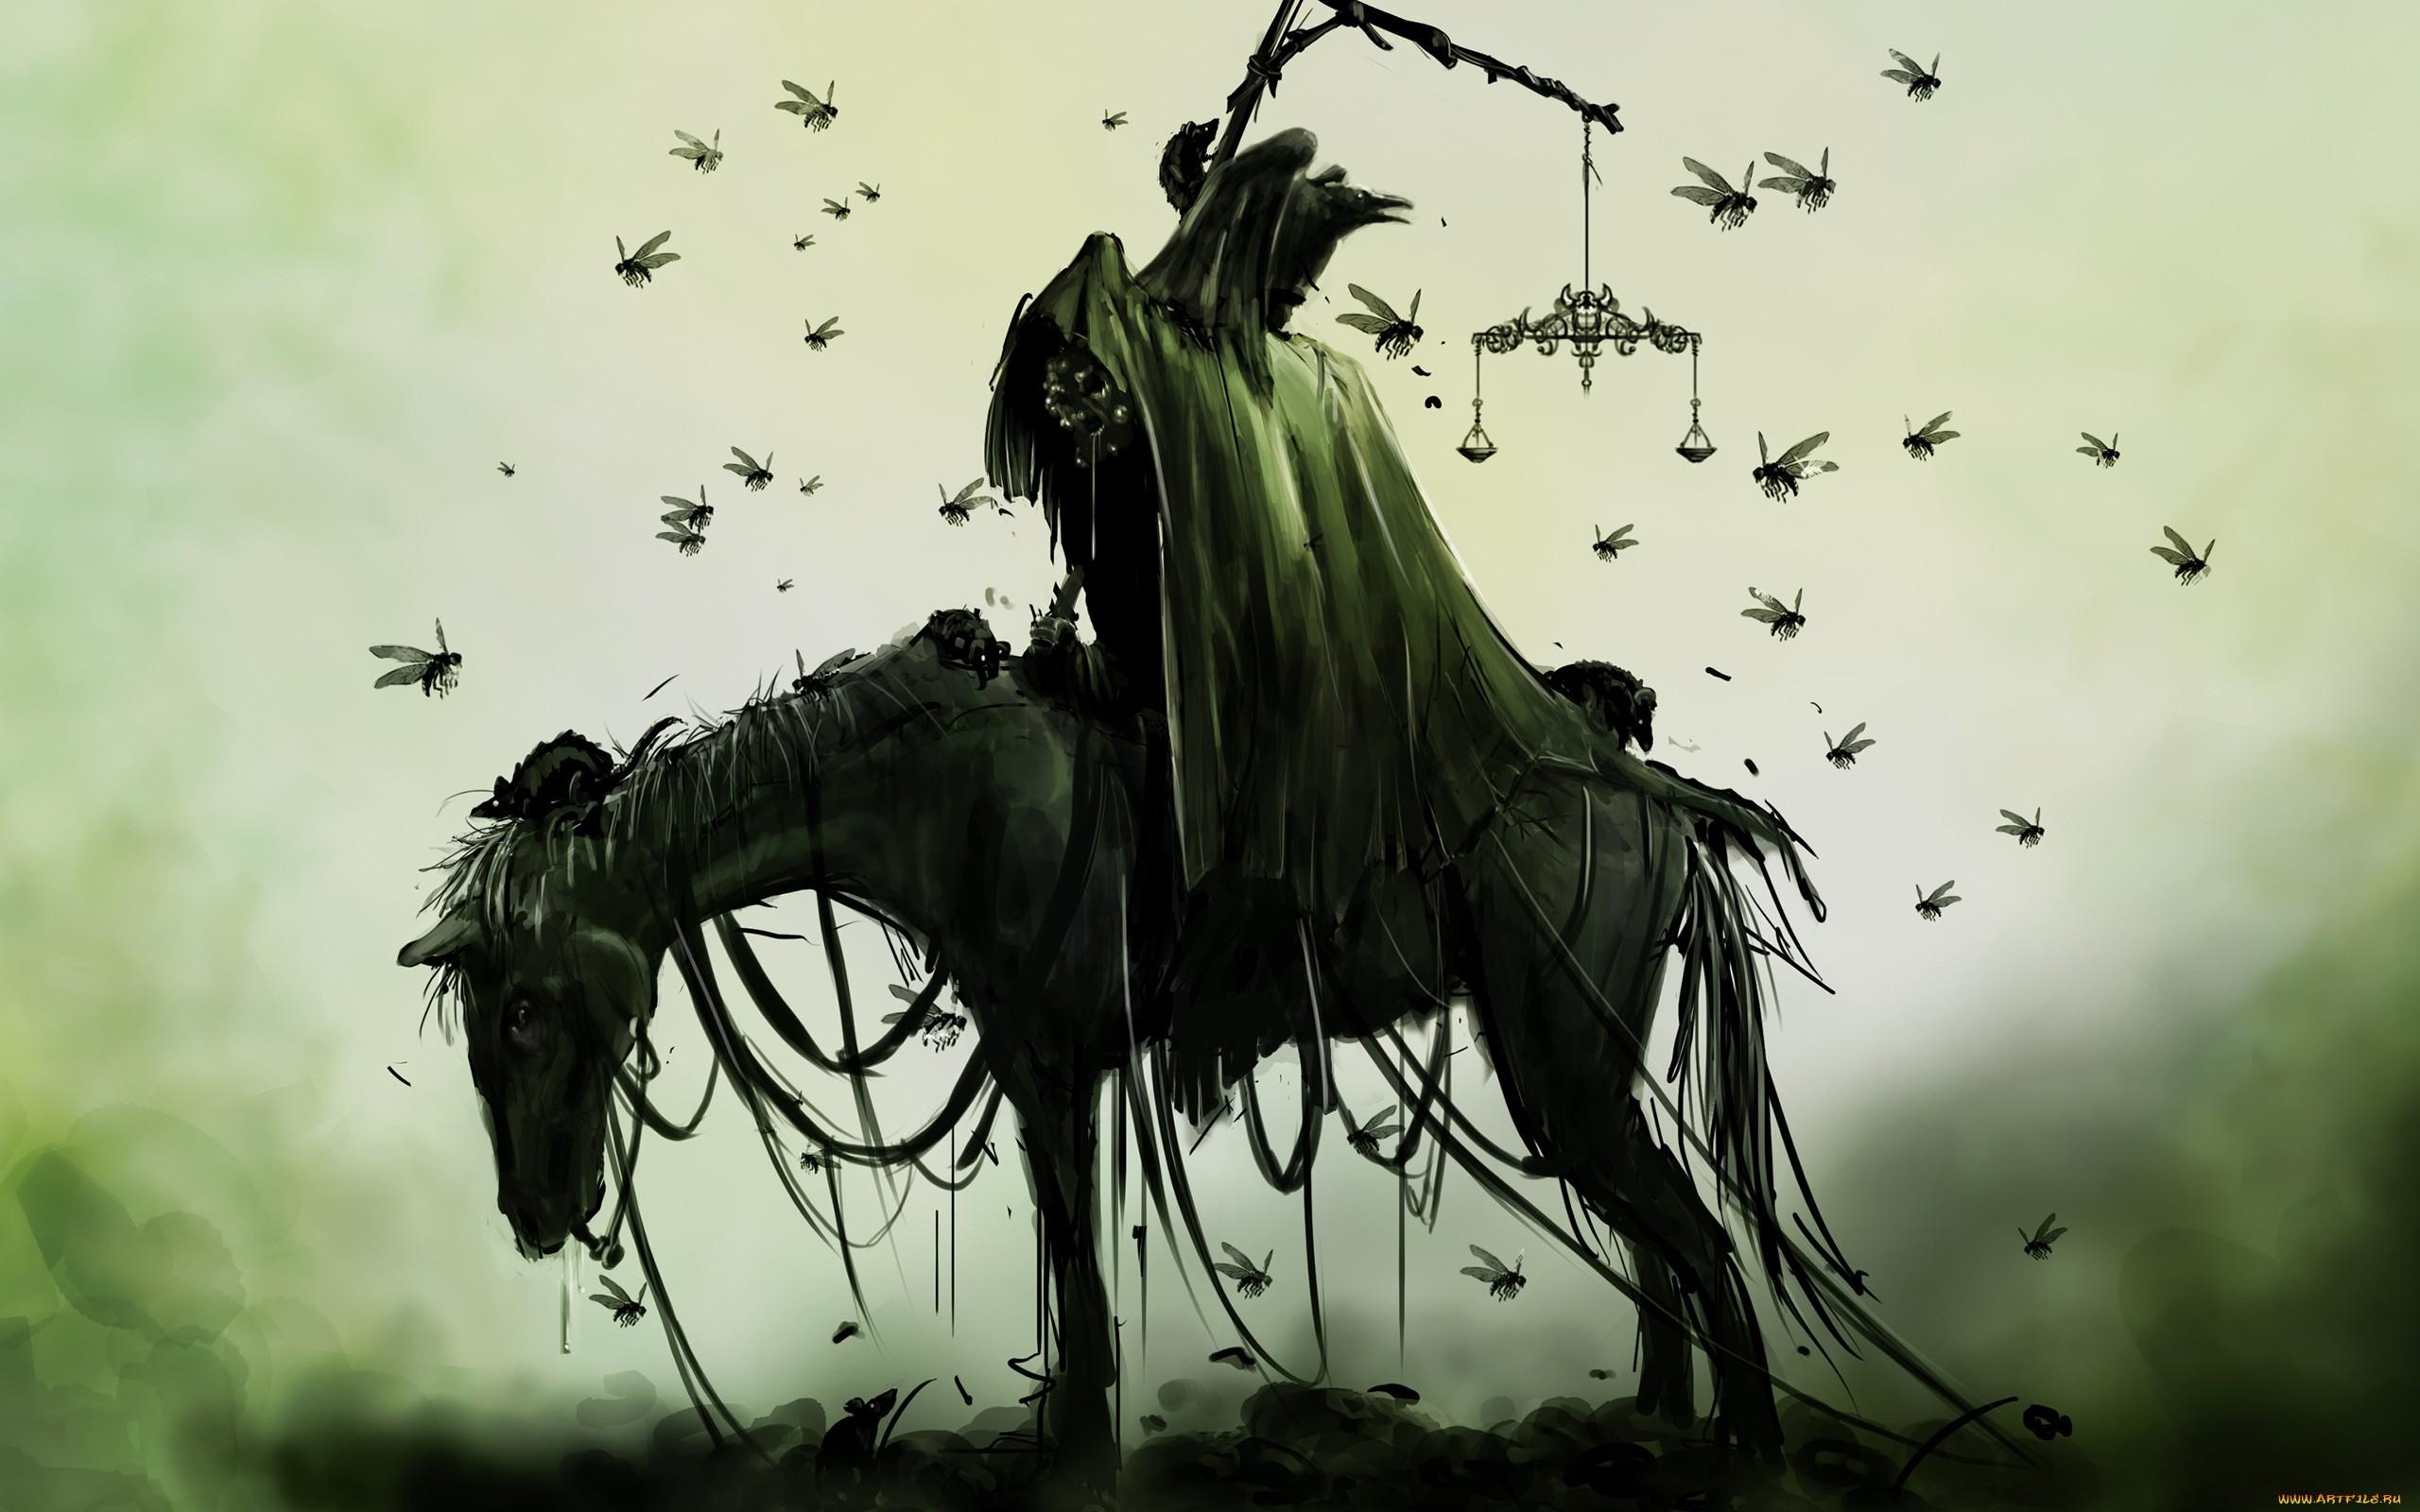 Horse Drawing Death Grim Reaper Bugs Green Dark Wallpaper 2560x1600 112766 Wallpaperup